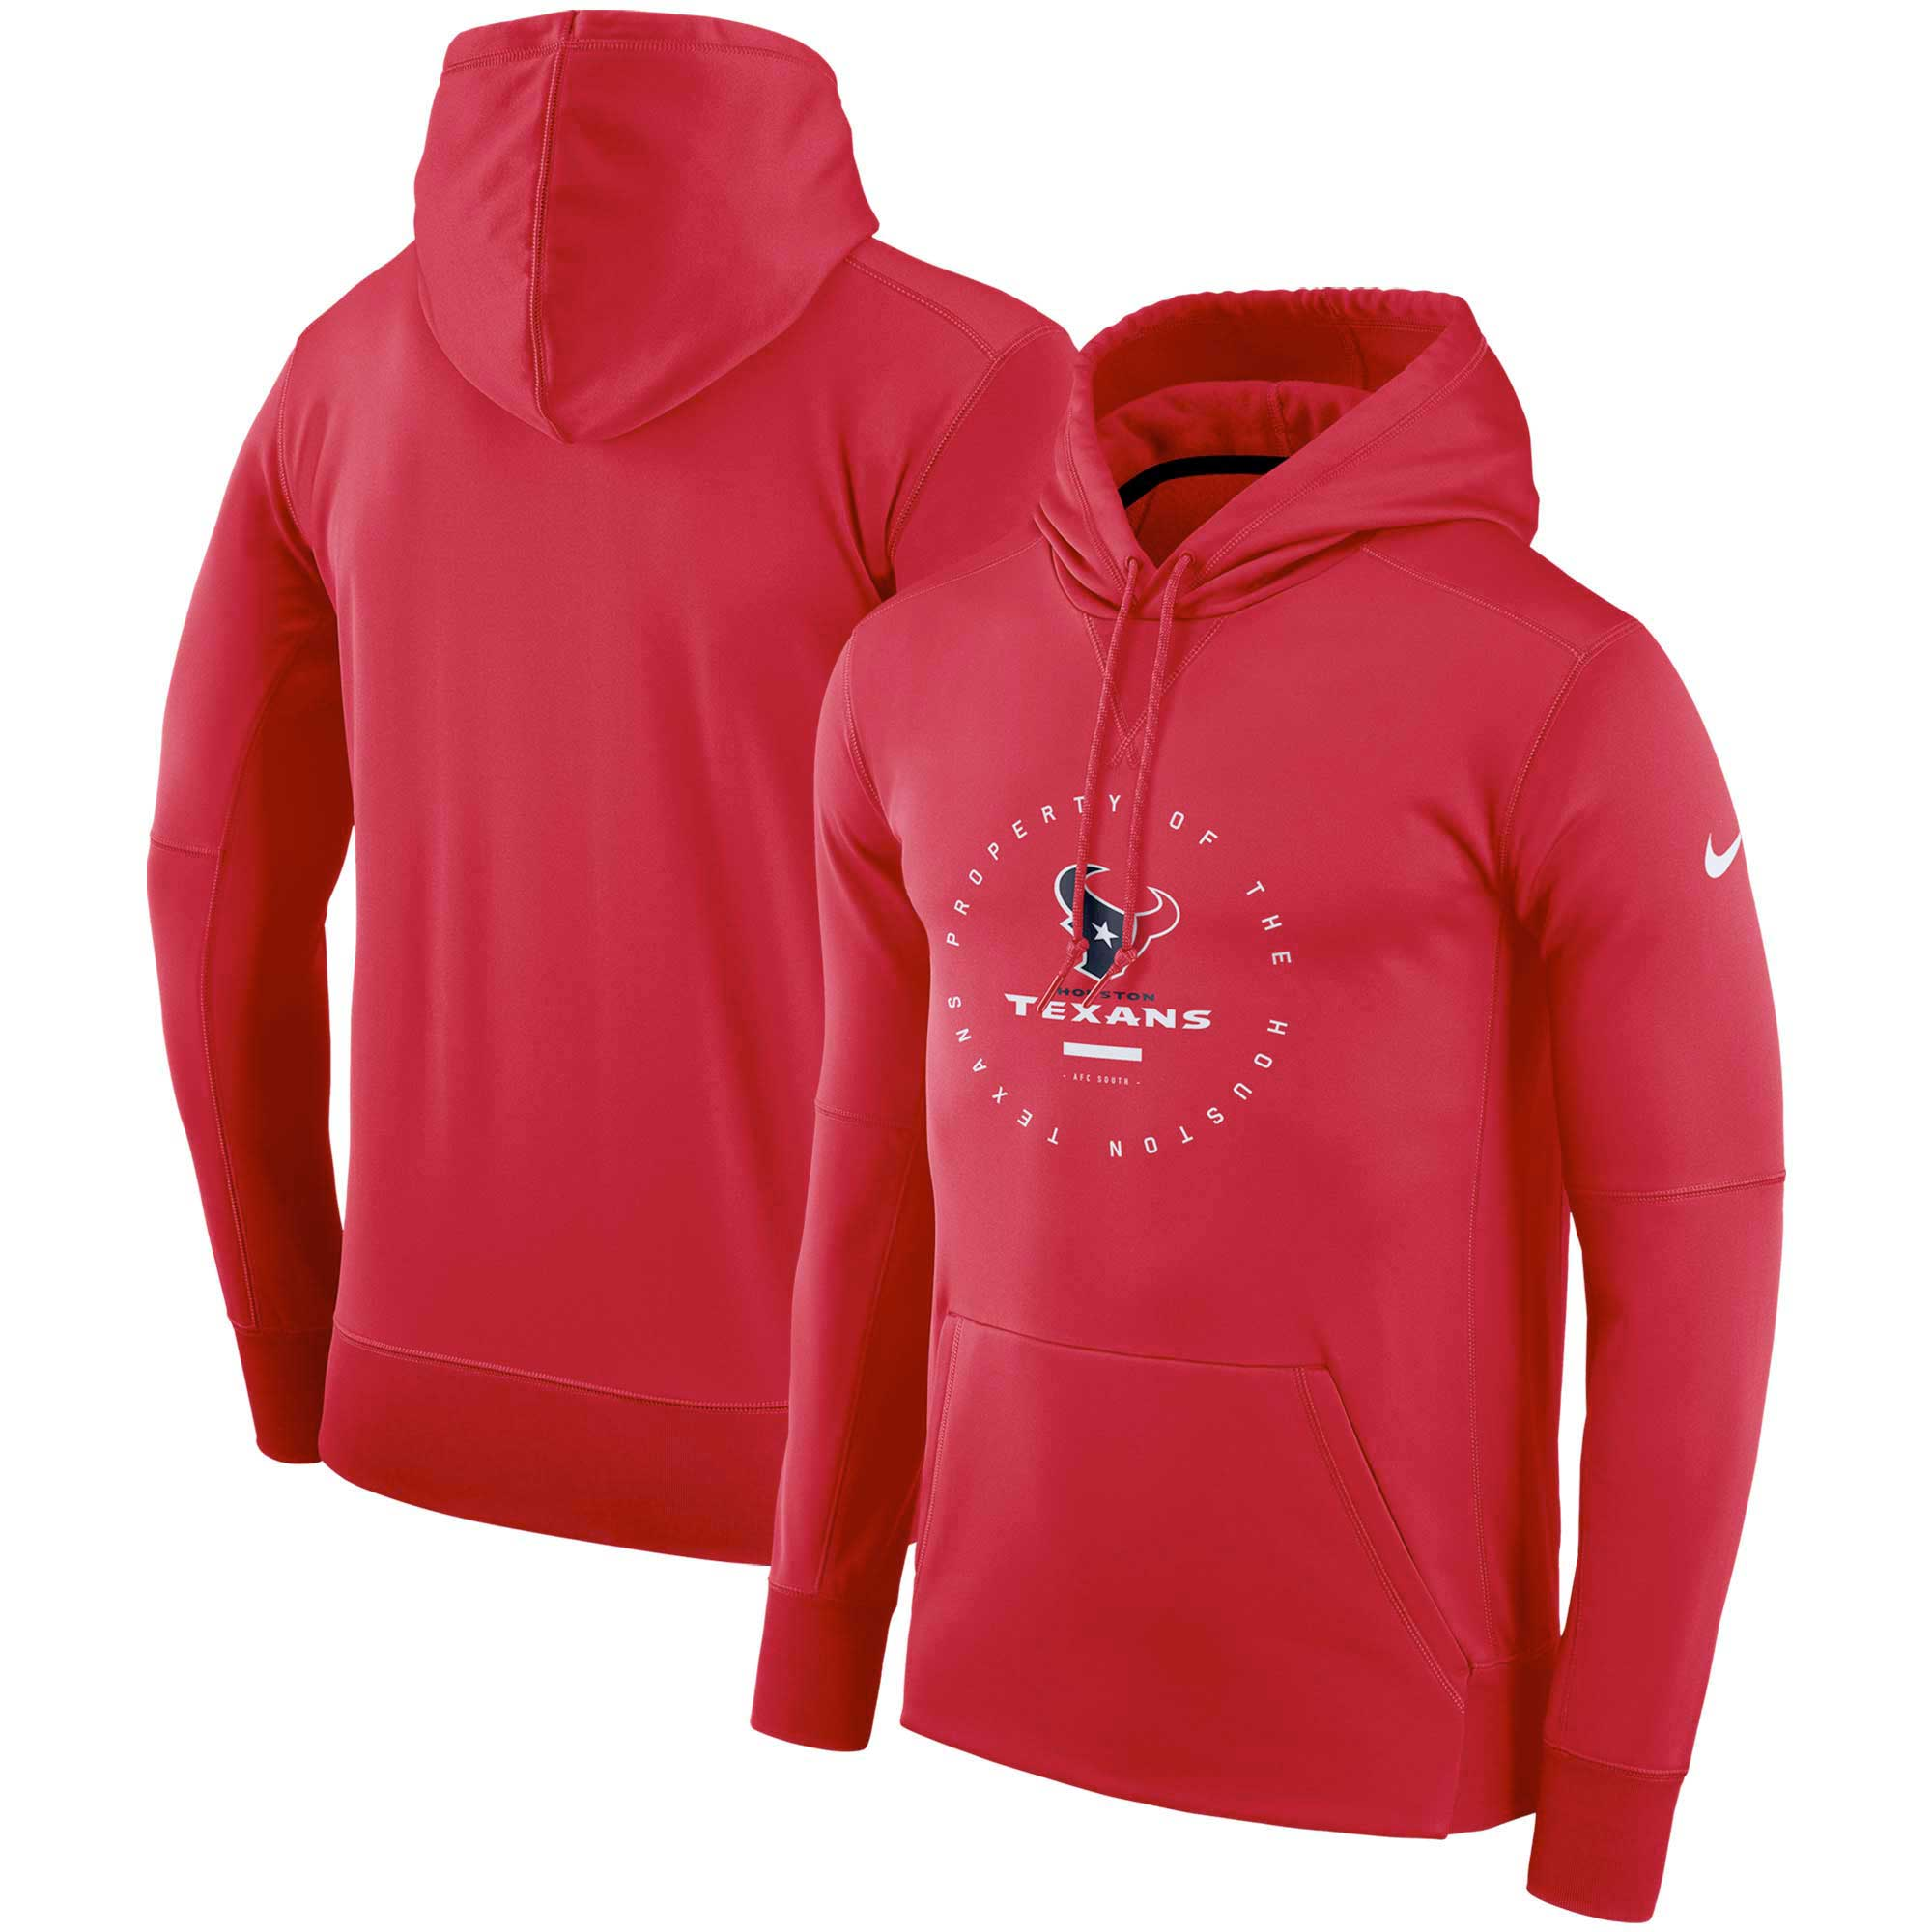 Houston Texans Nike Sideline Property Of Wordmark Logo Performance Pullover Hoodie - Red